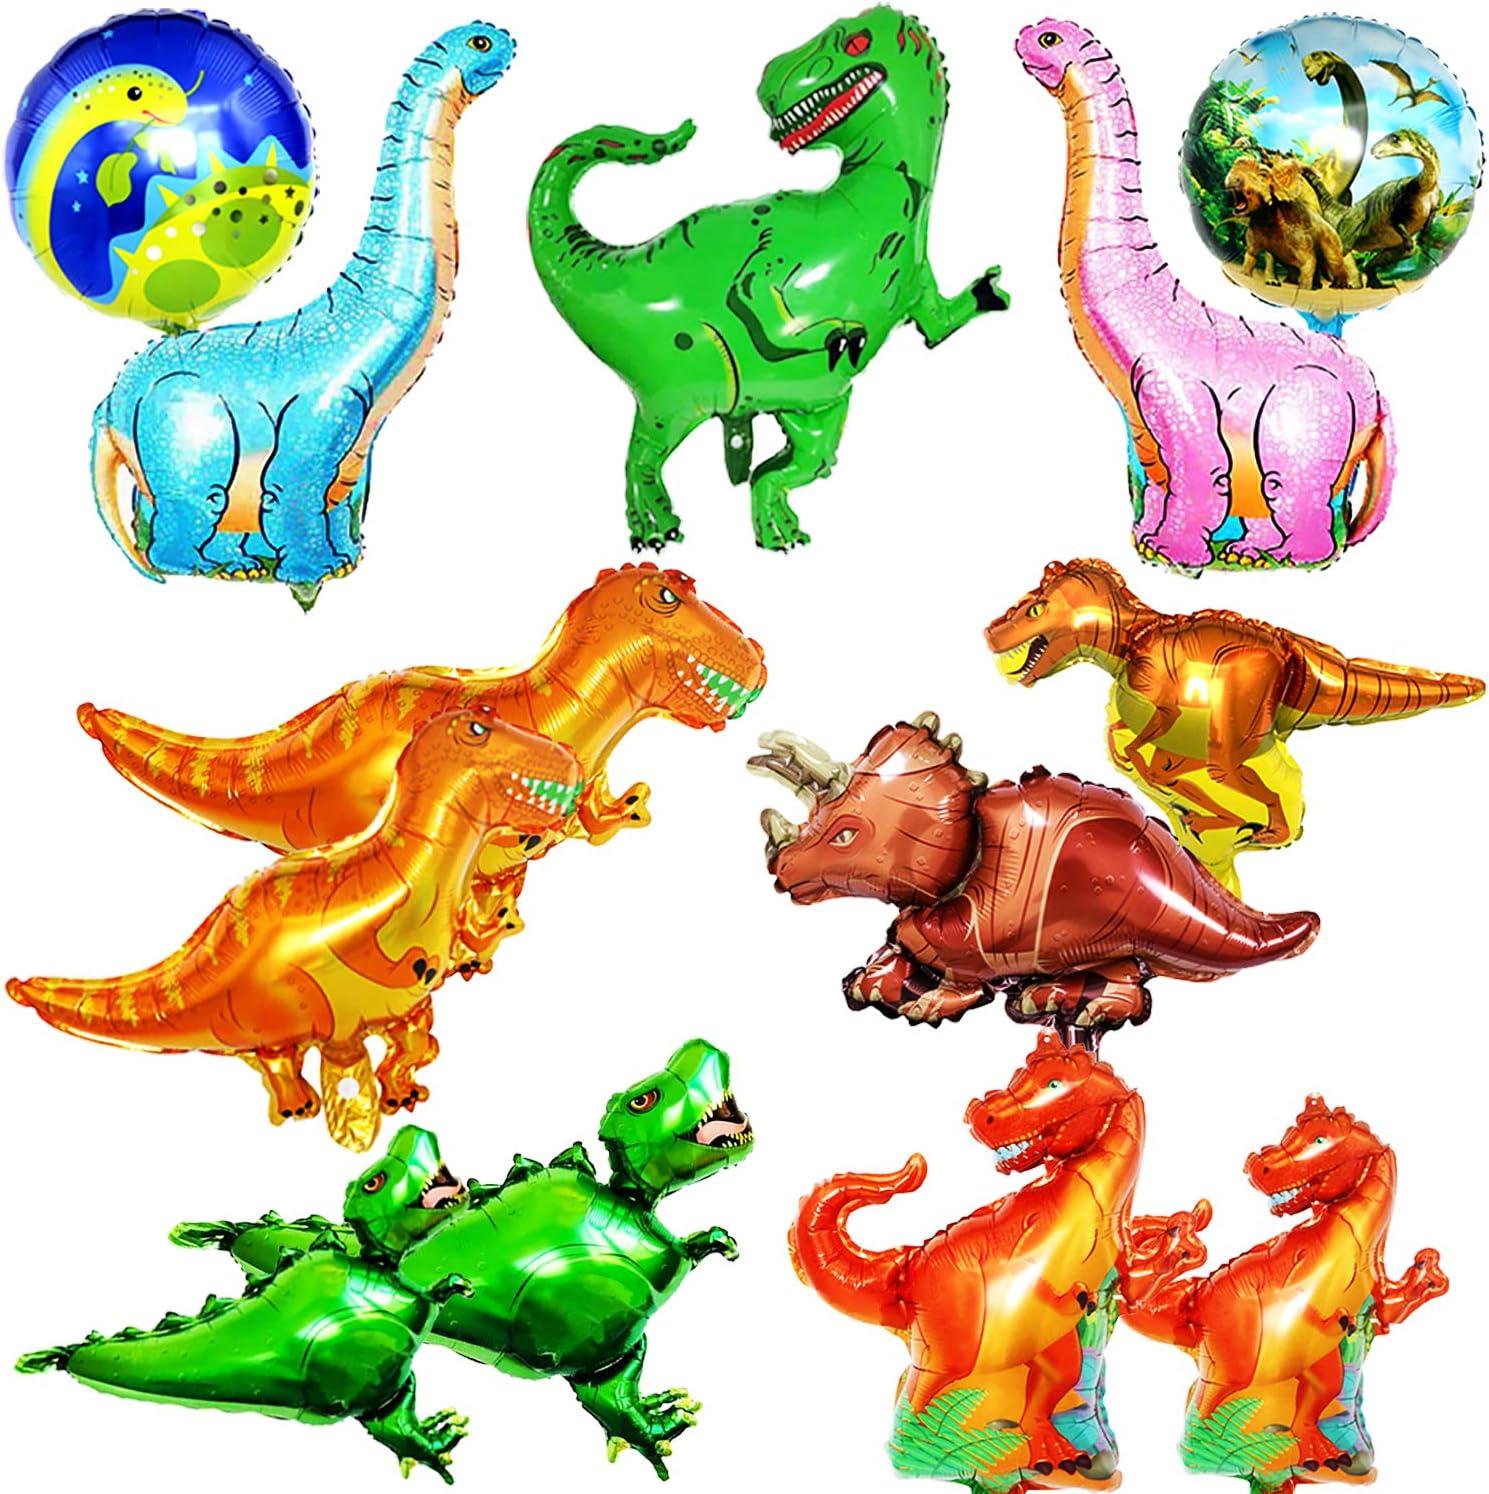 BESTZY Dinosaurio Globo 13pcs Mascota Foil Balloons Globos Pelotas Sets De Decoración para Fiesta Bodas Decoracion de Fiesta de Cumpleanos Regalo de ninos